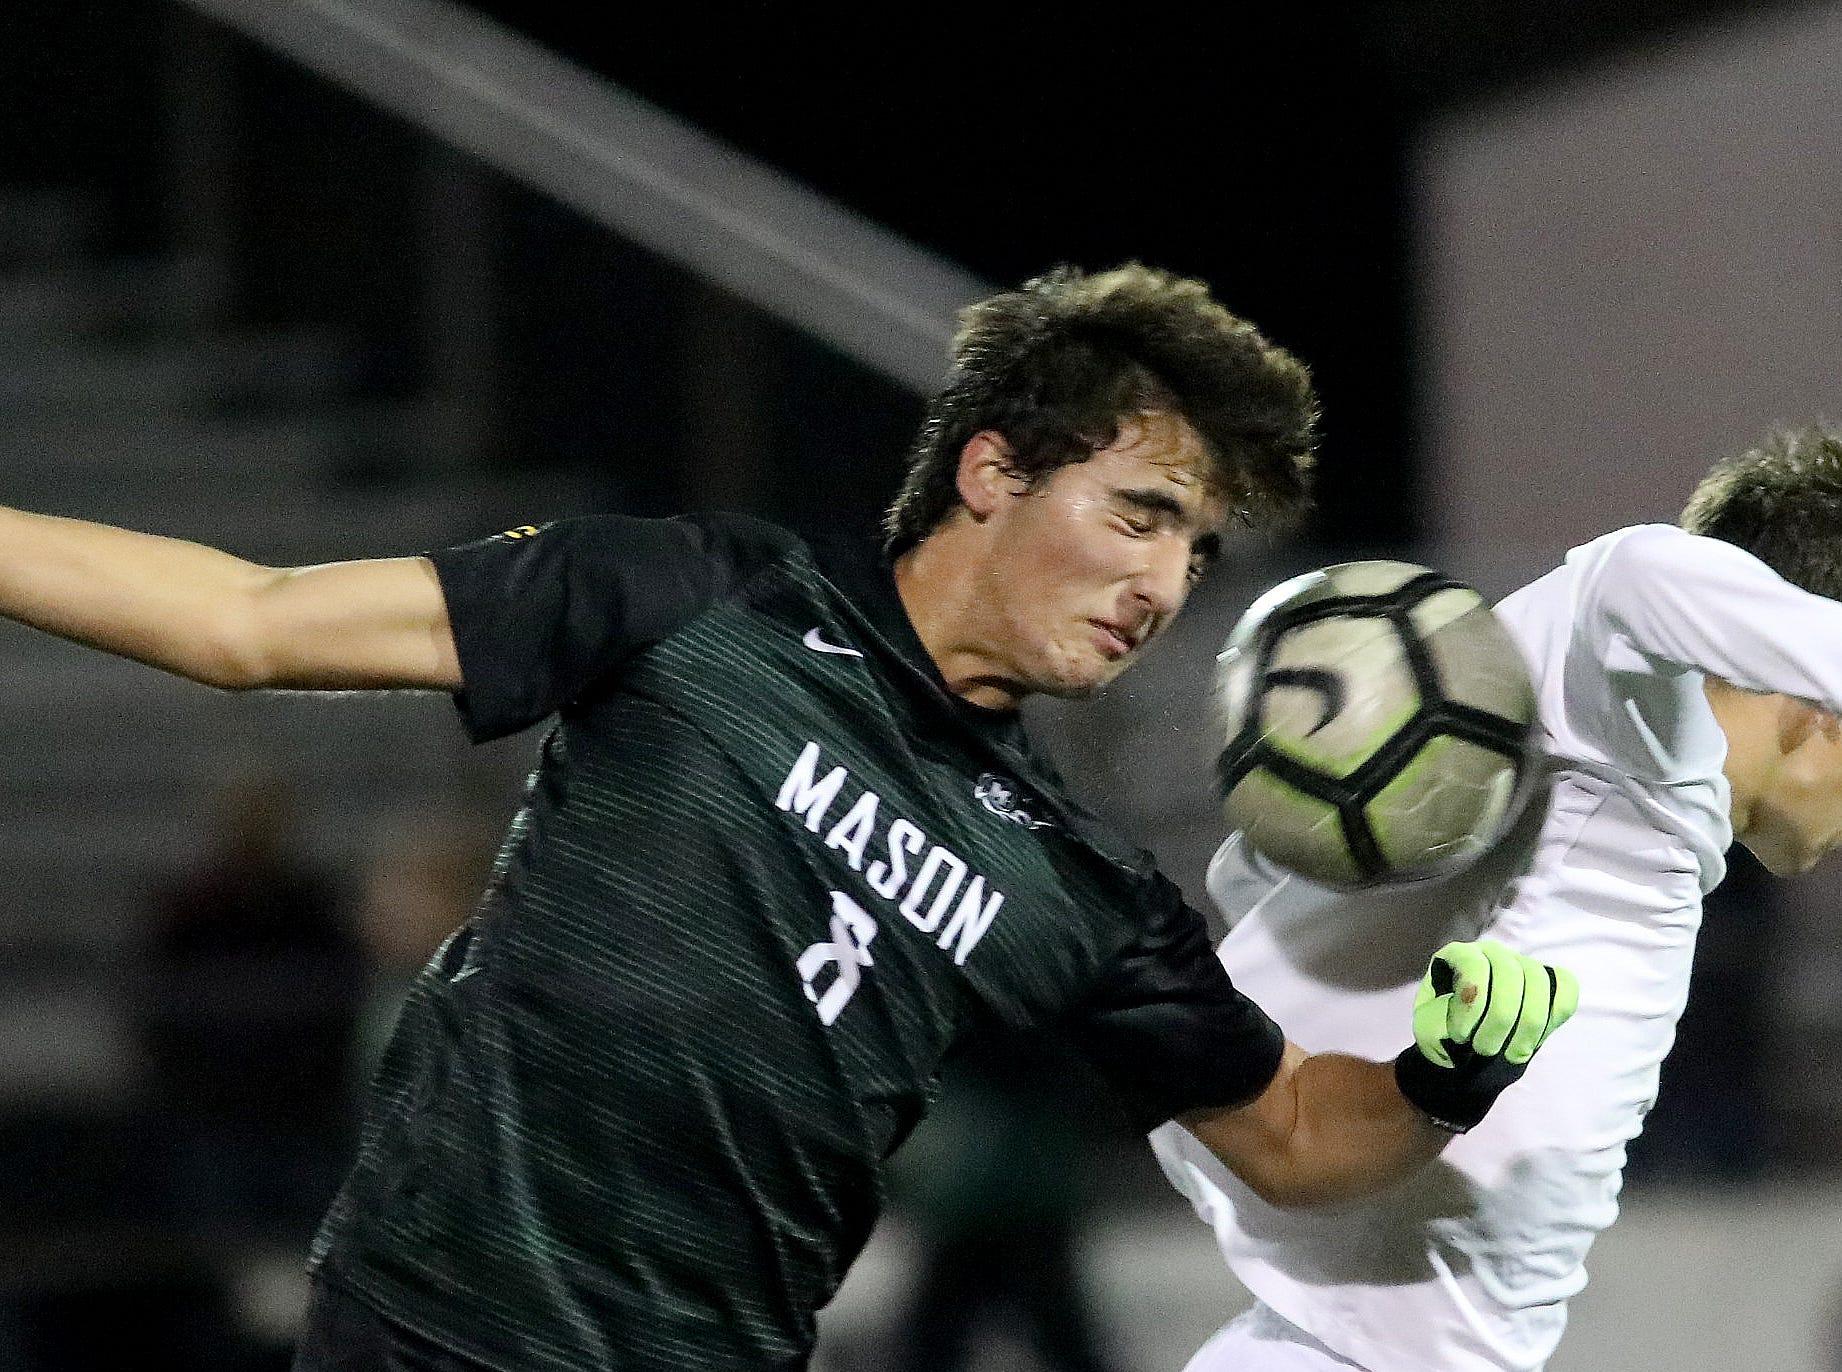 Mason midfielder Sebastian Amaya (8) battles Moeller midfielder Ben Hegge in the district final.